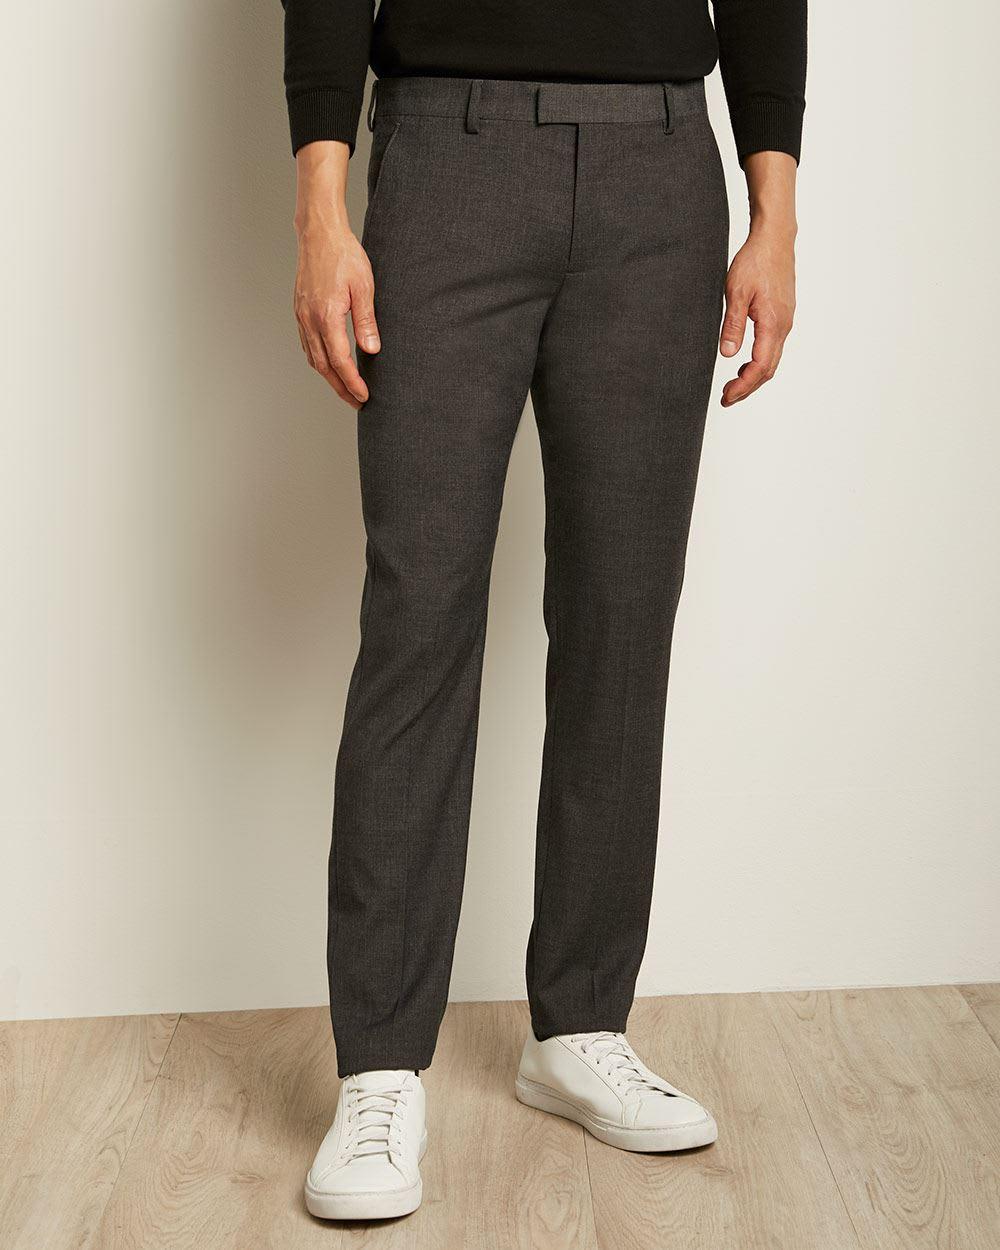 Essential Slim Fit Dark Grey suit Pant